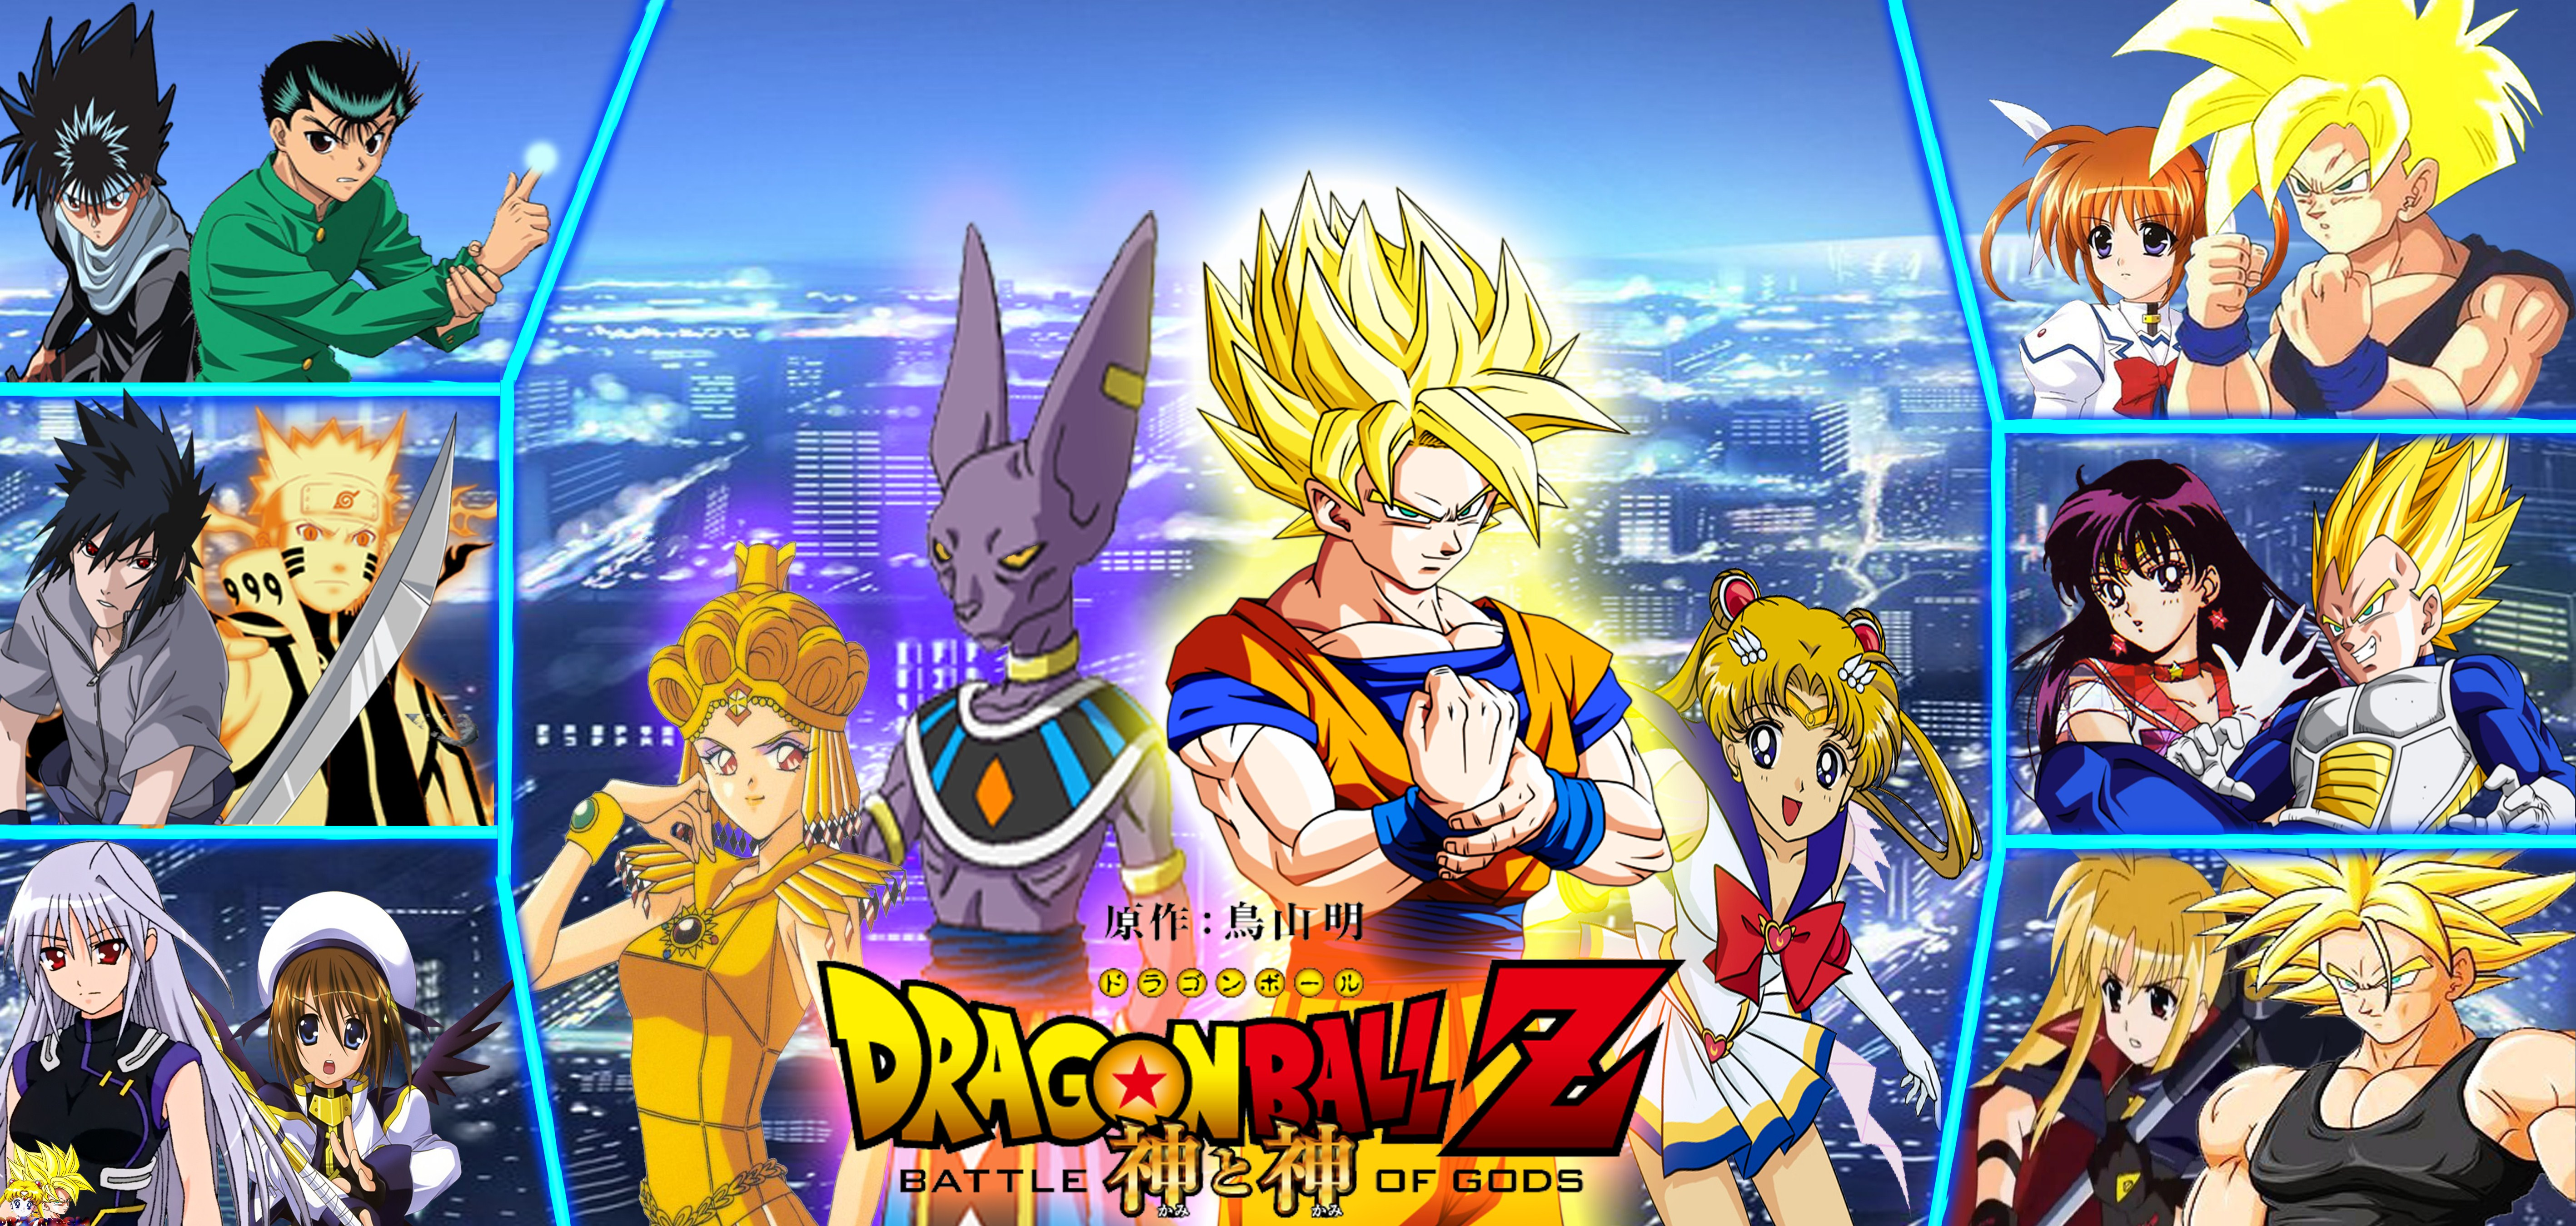 dragon ball z crossover 5 battle of gods by dbzandsm on deviantart